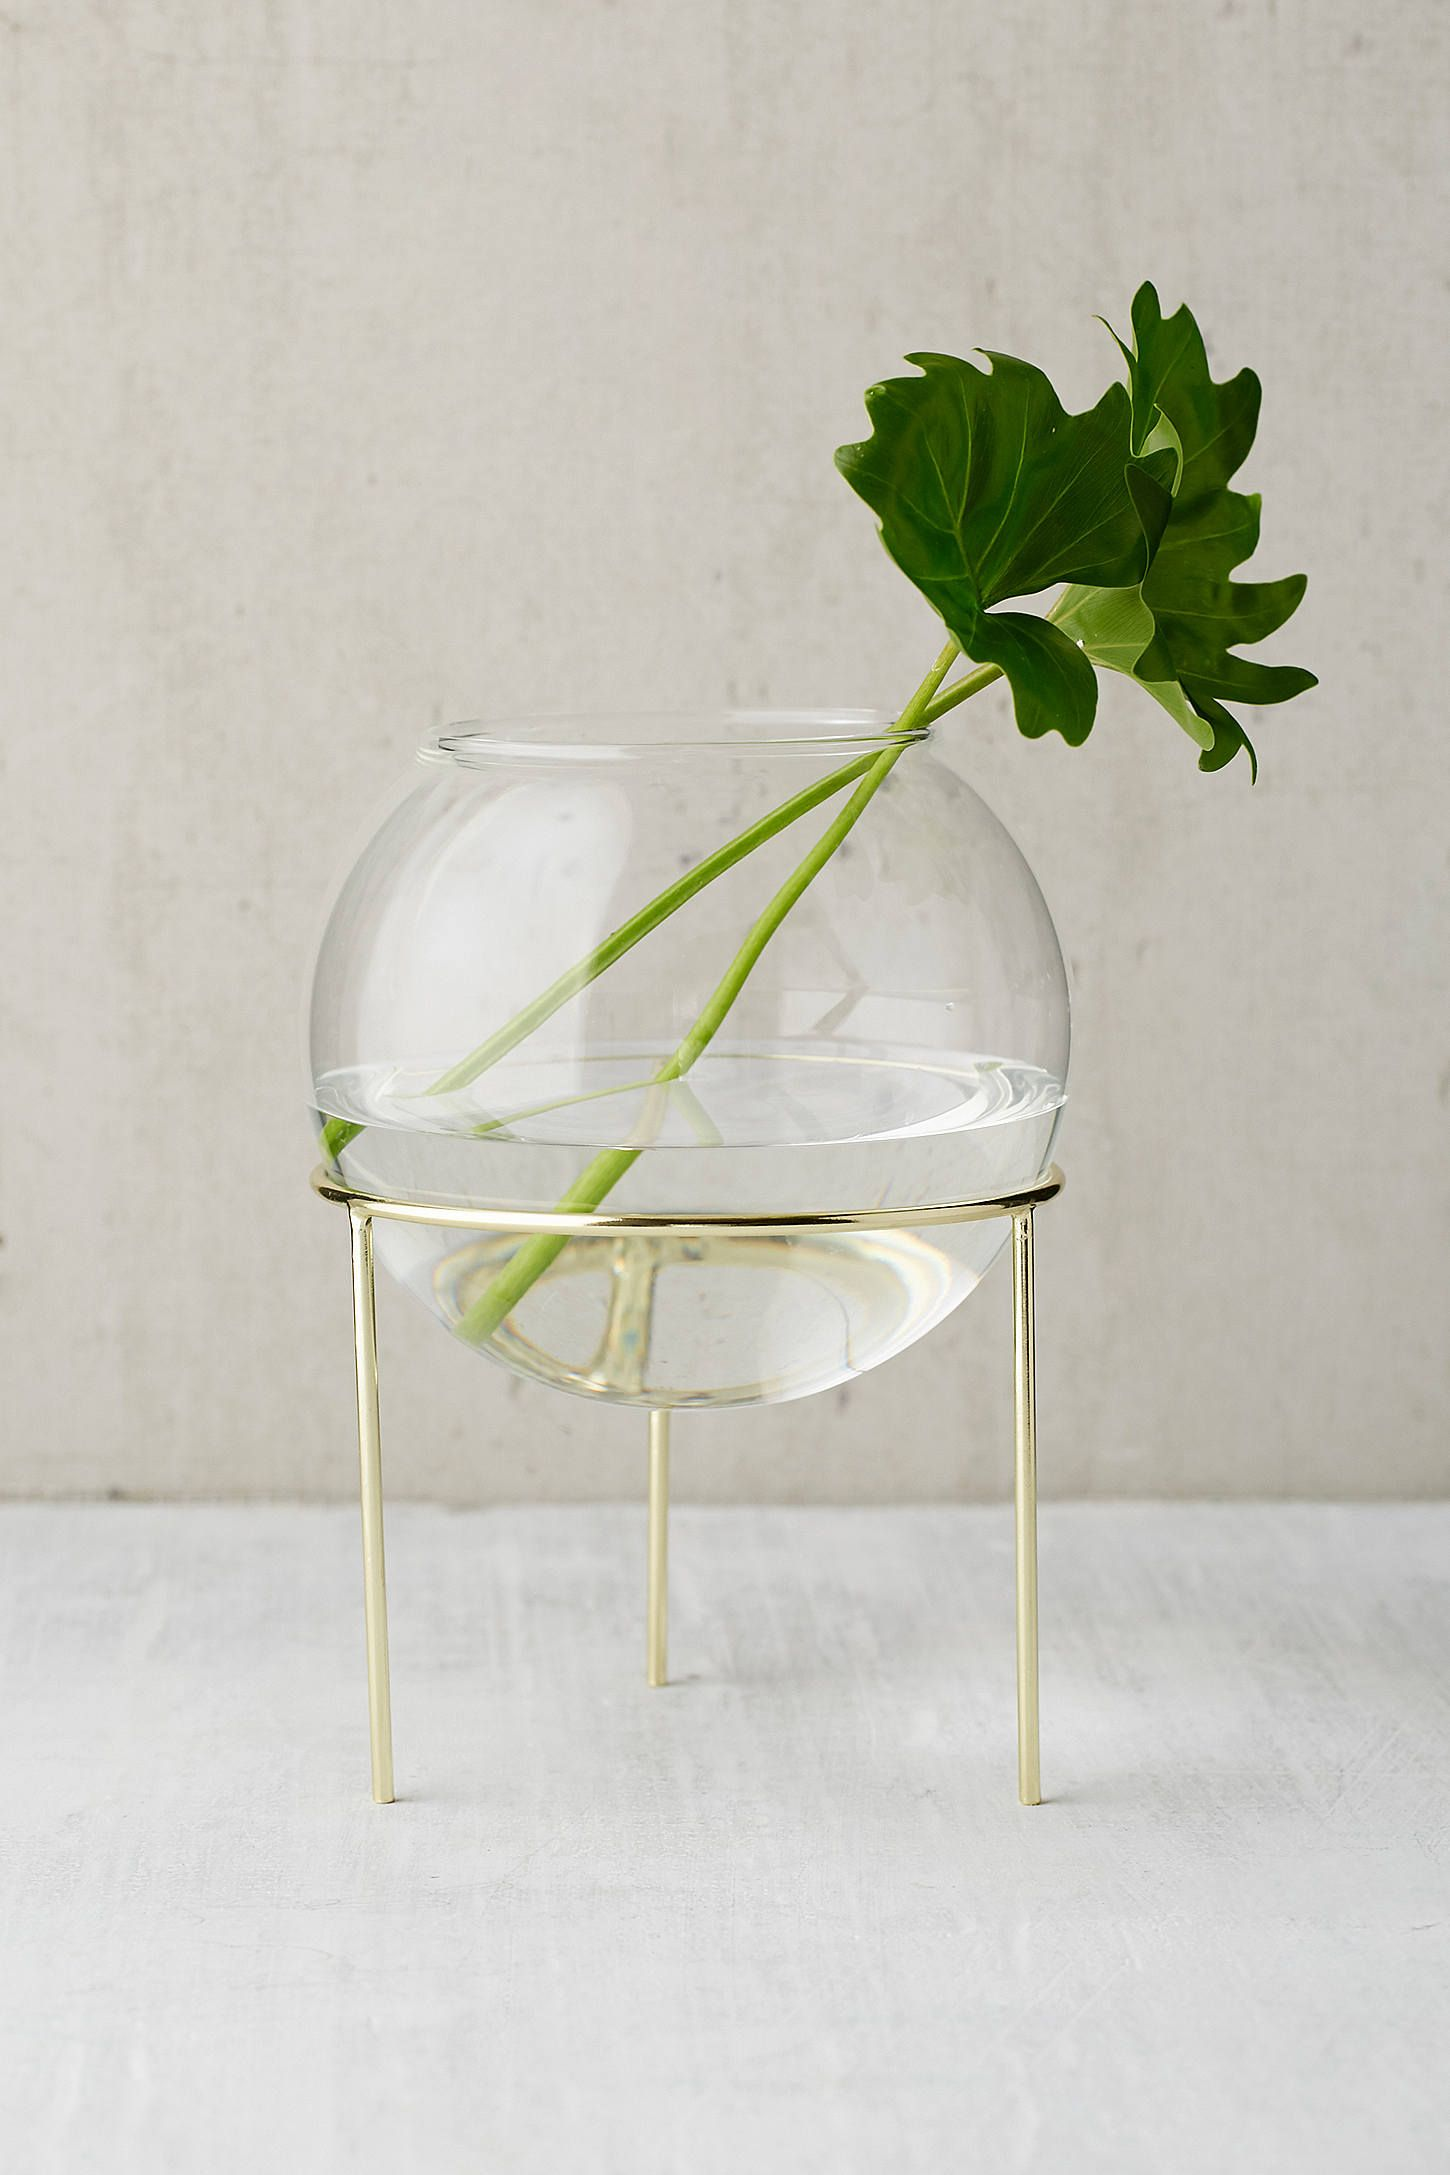 ida glass globe planter tripod stand tripod planters and globe